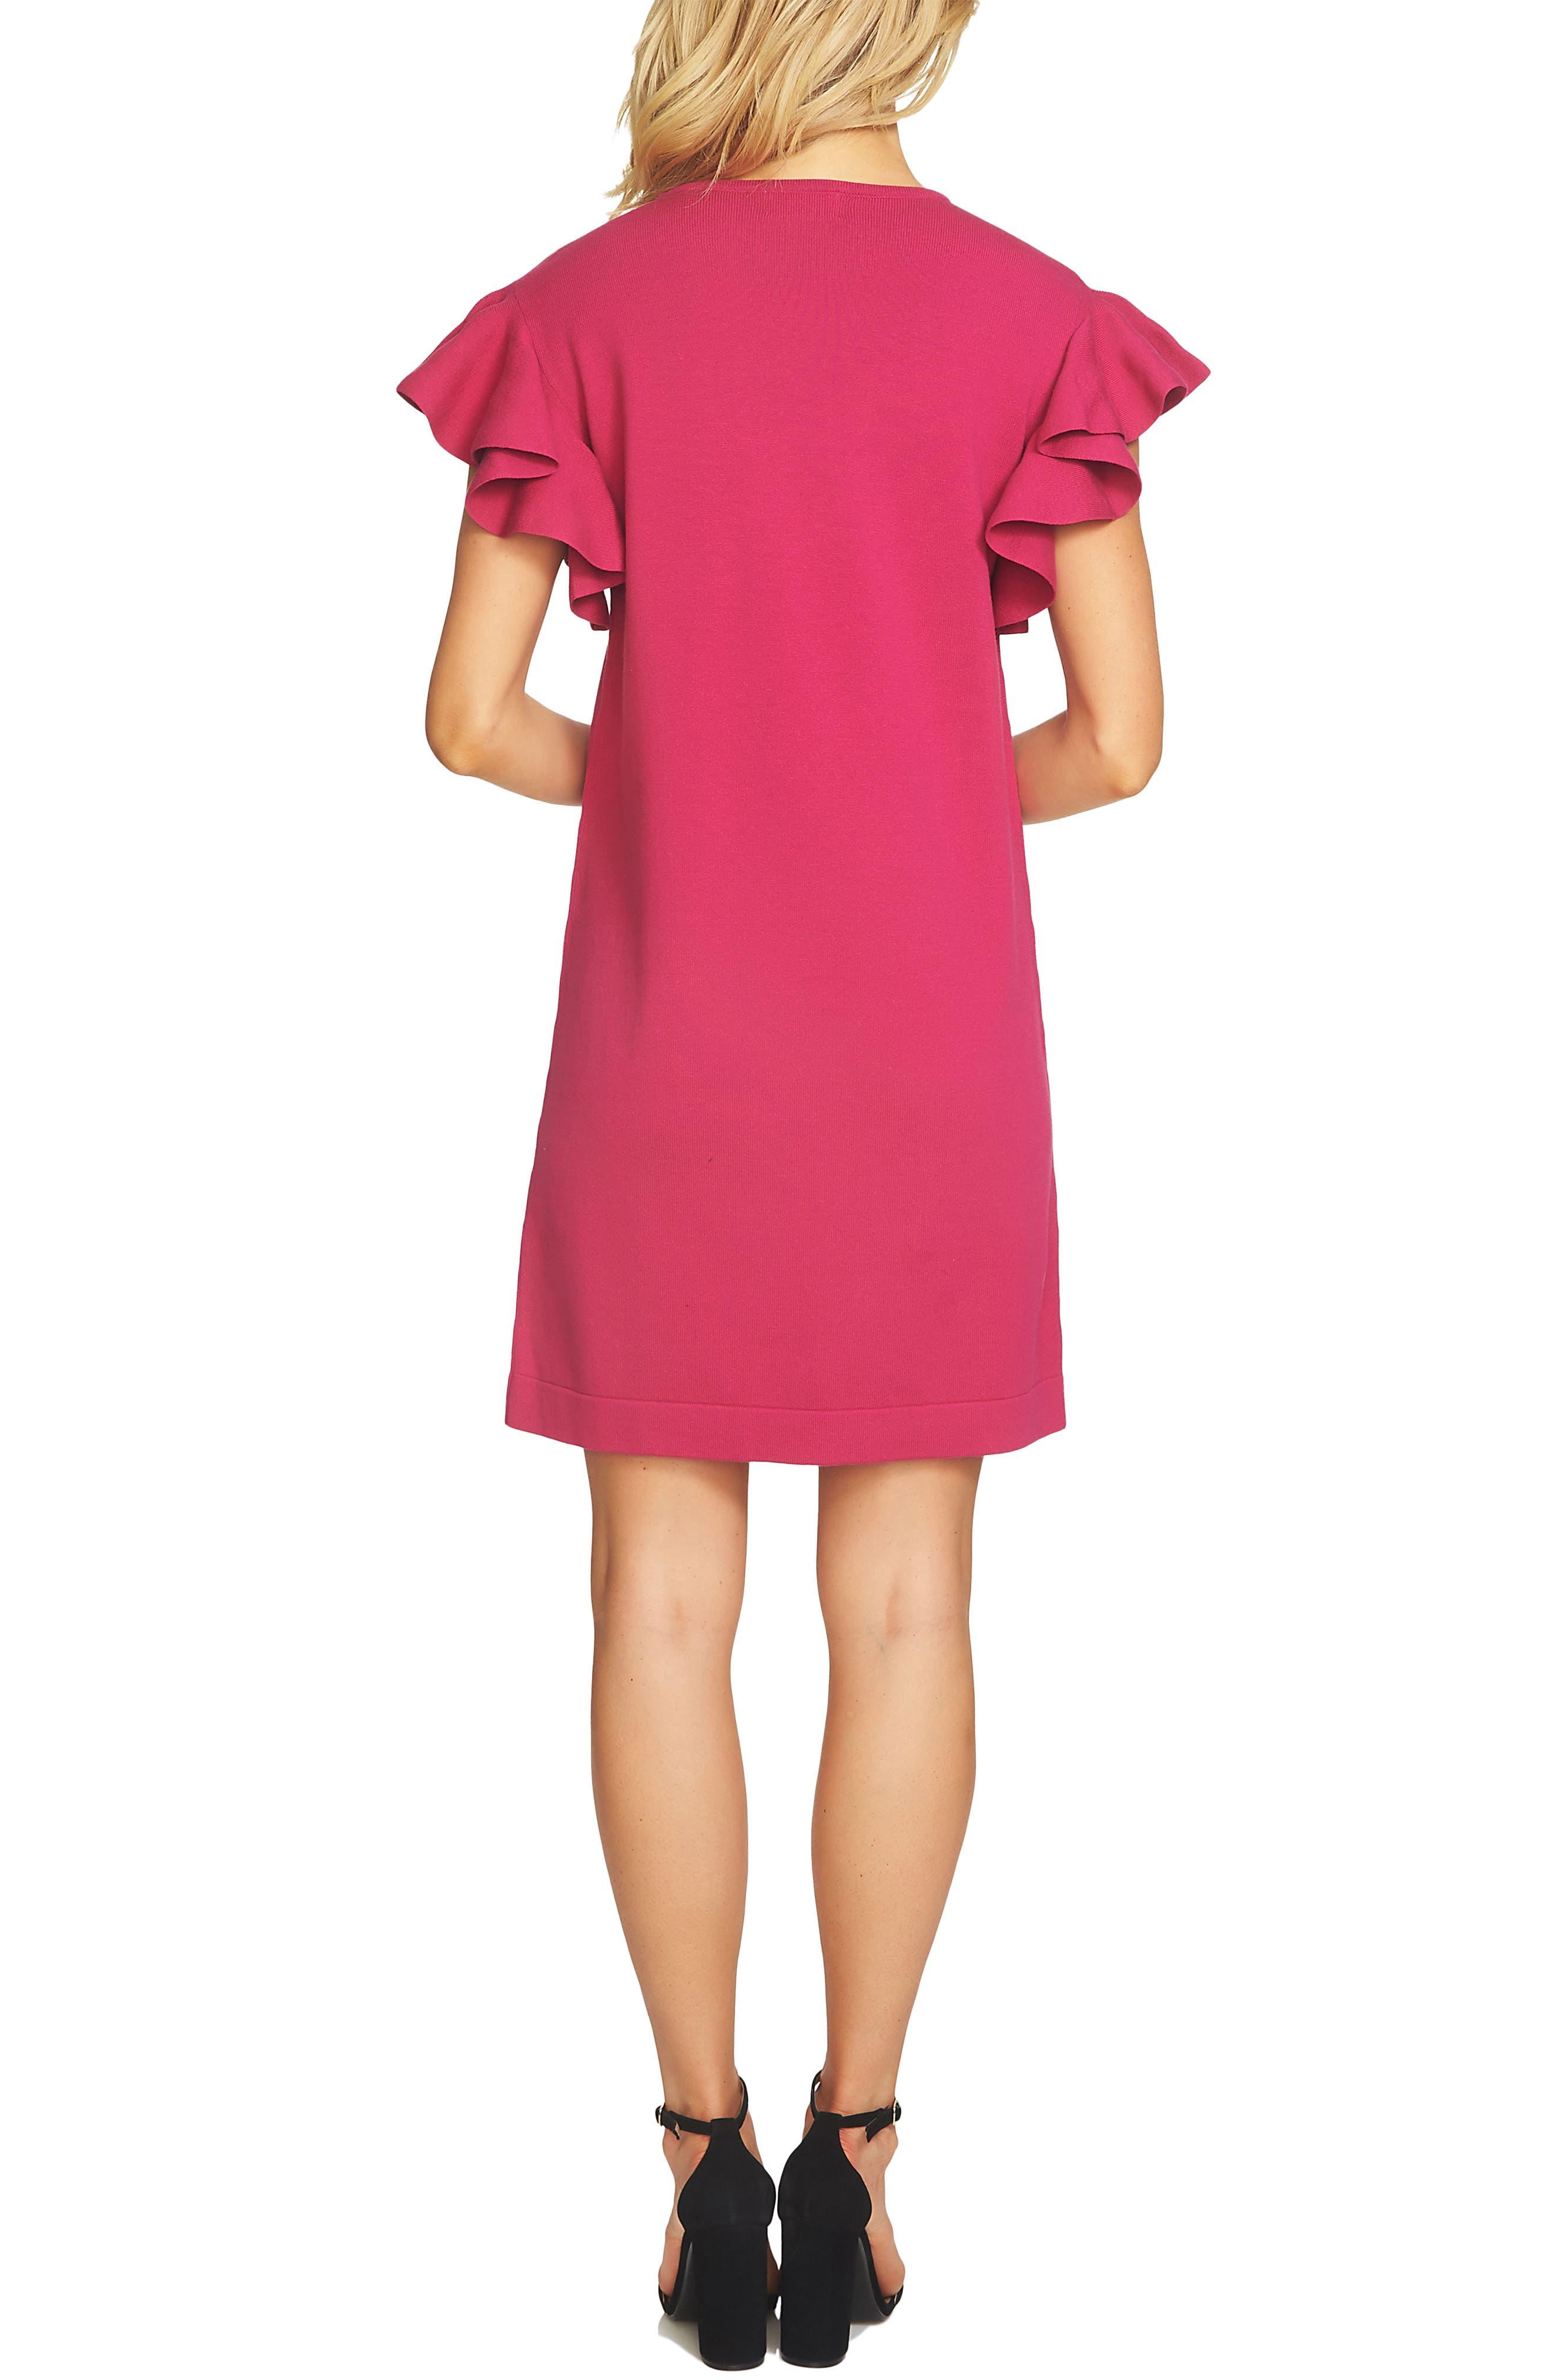 Ruffle Sleeve Sweater Dress,                             Alternate thumbnail 2, color,                             Vibrant Cerise